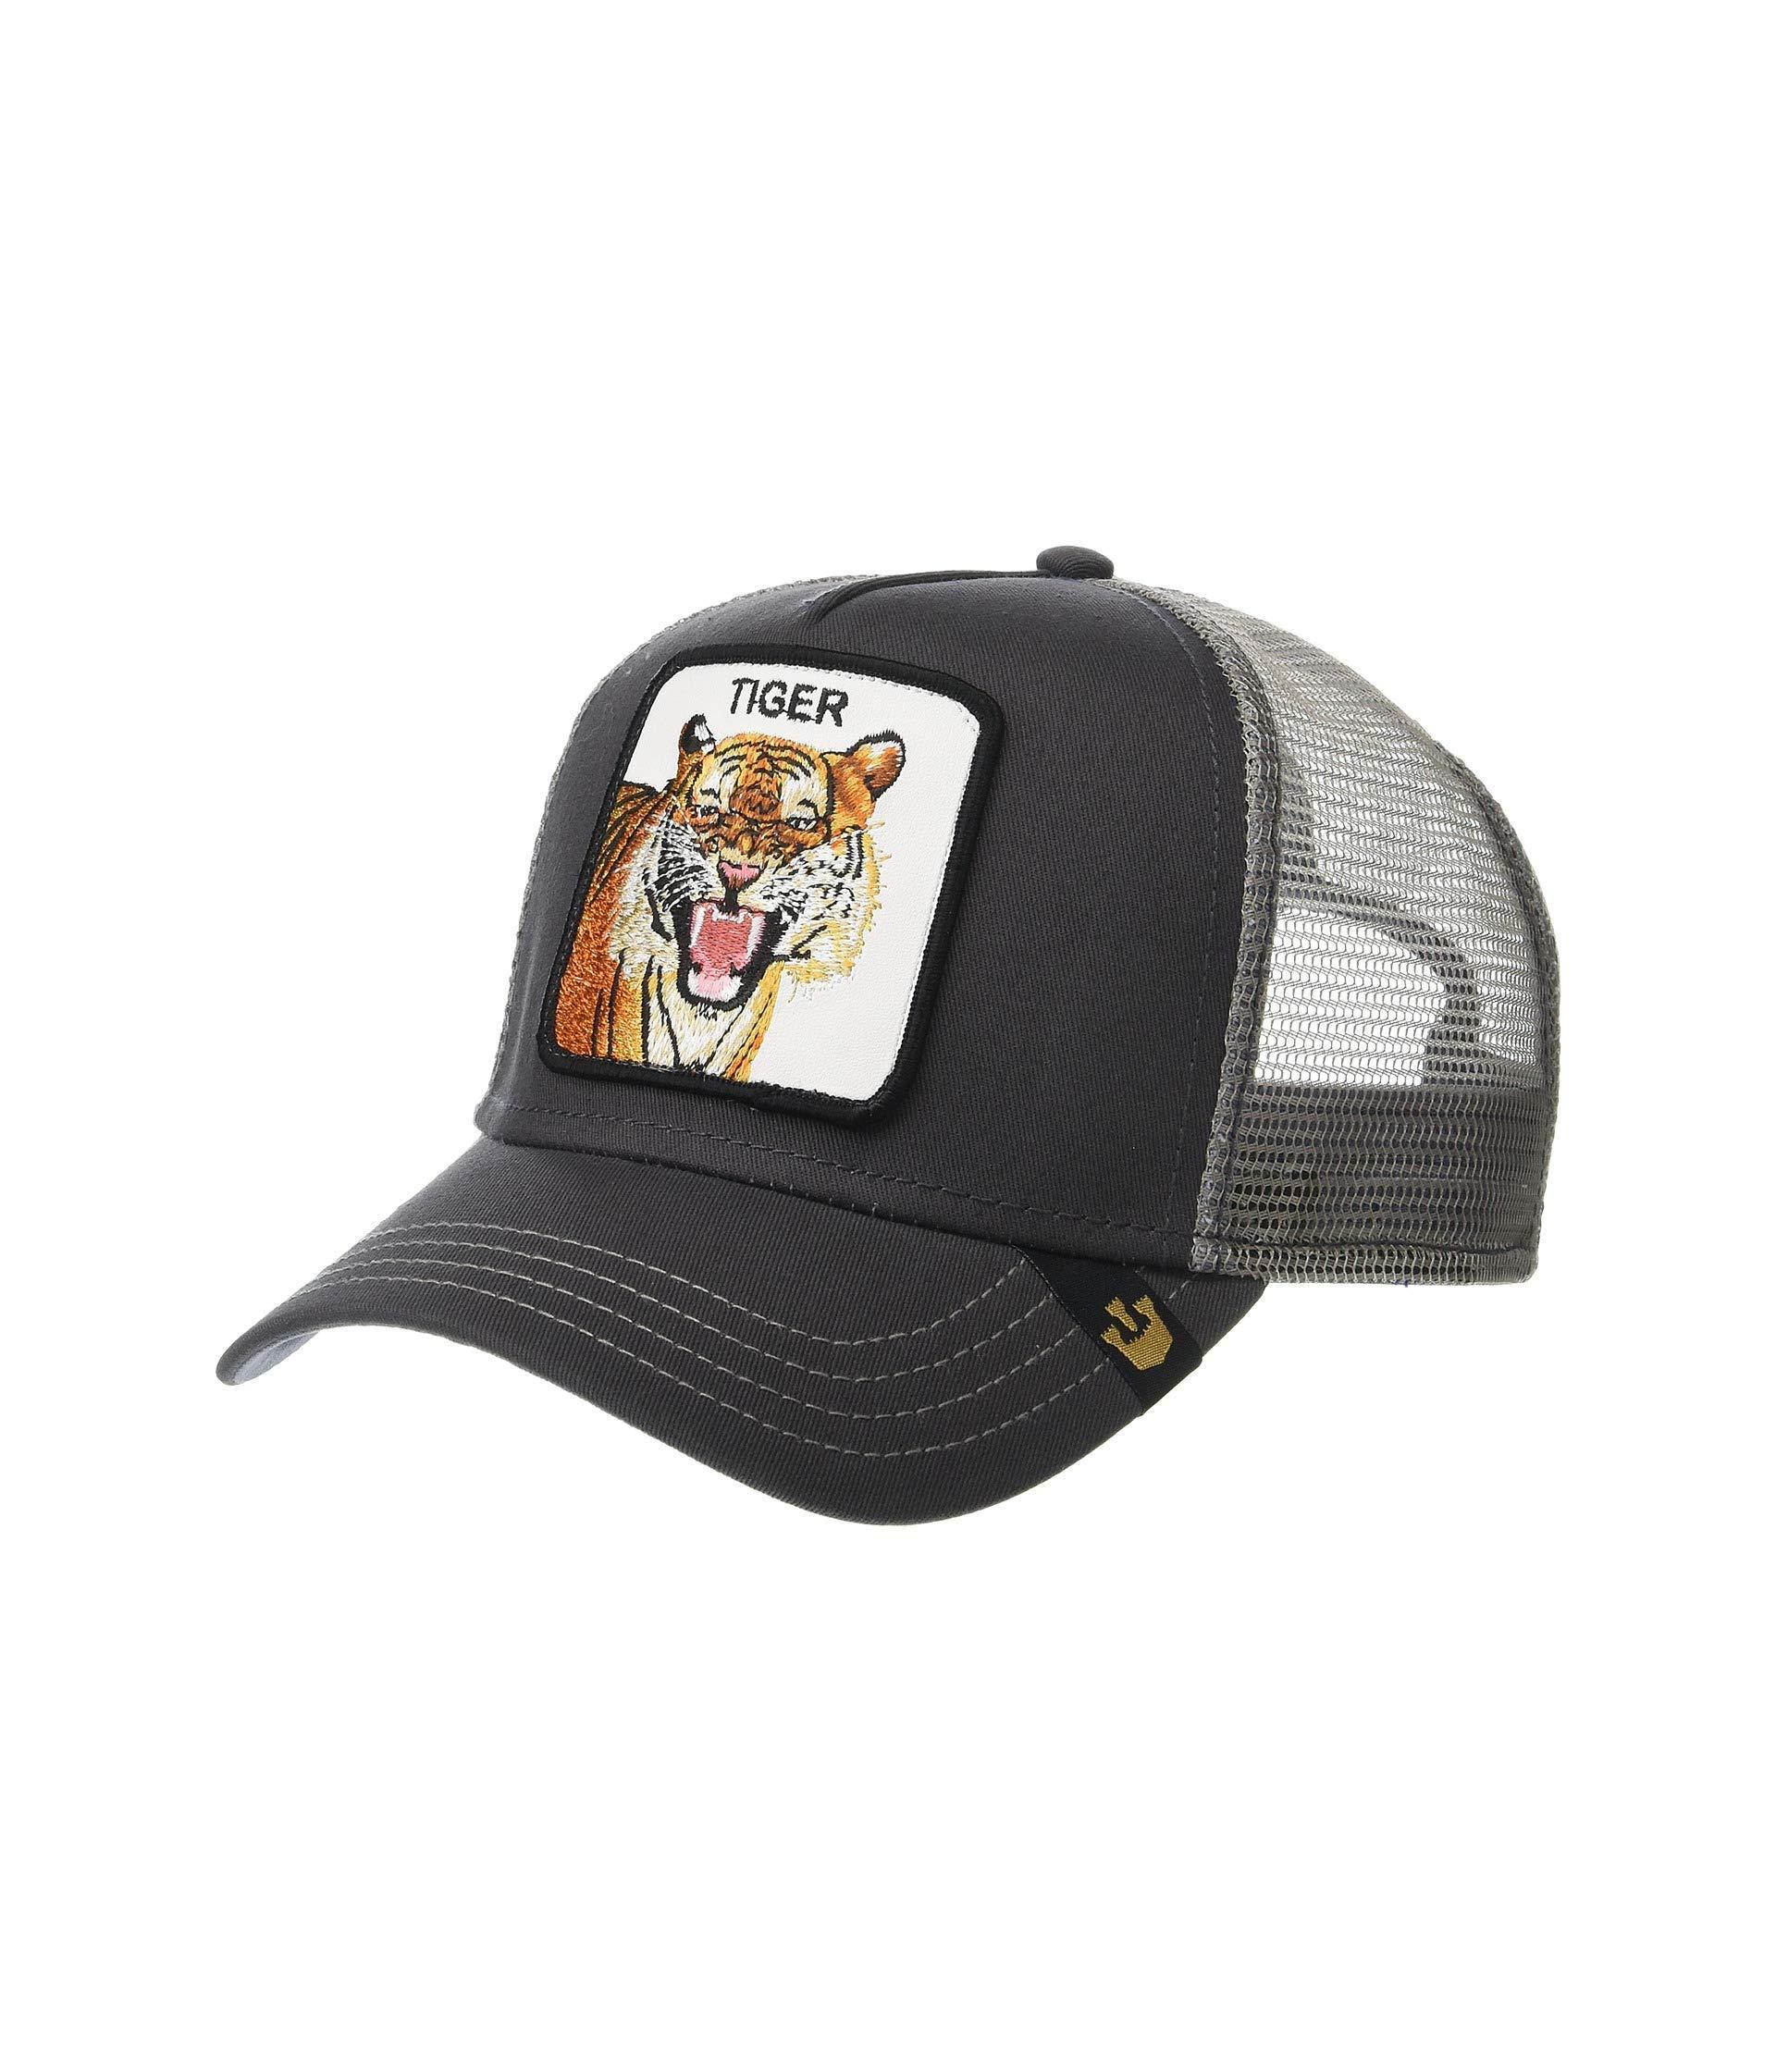 5c660a08ced Lyst - Goorin Bros Animal Farm Snap Back Trucker Hat (brown Chicky ...